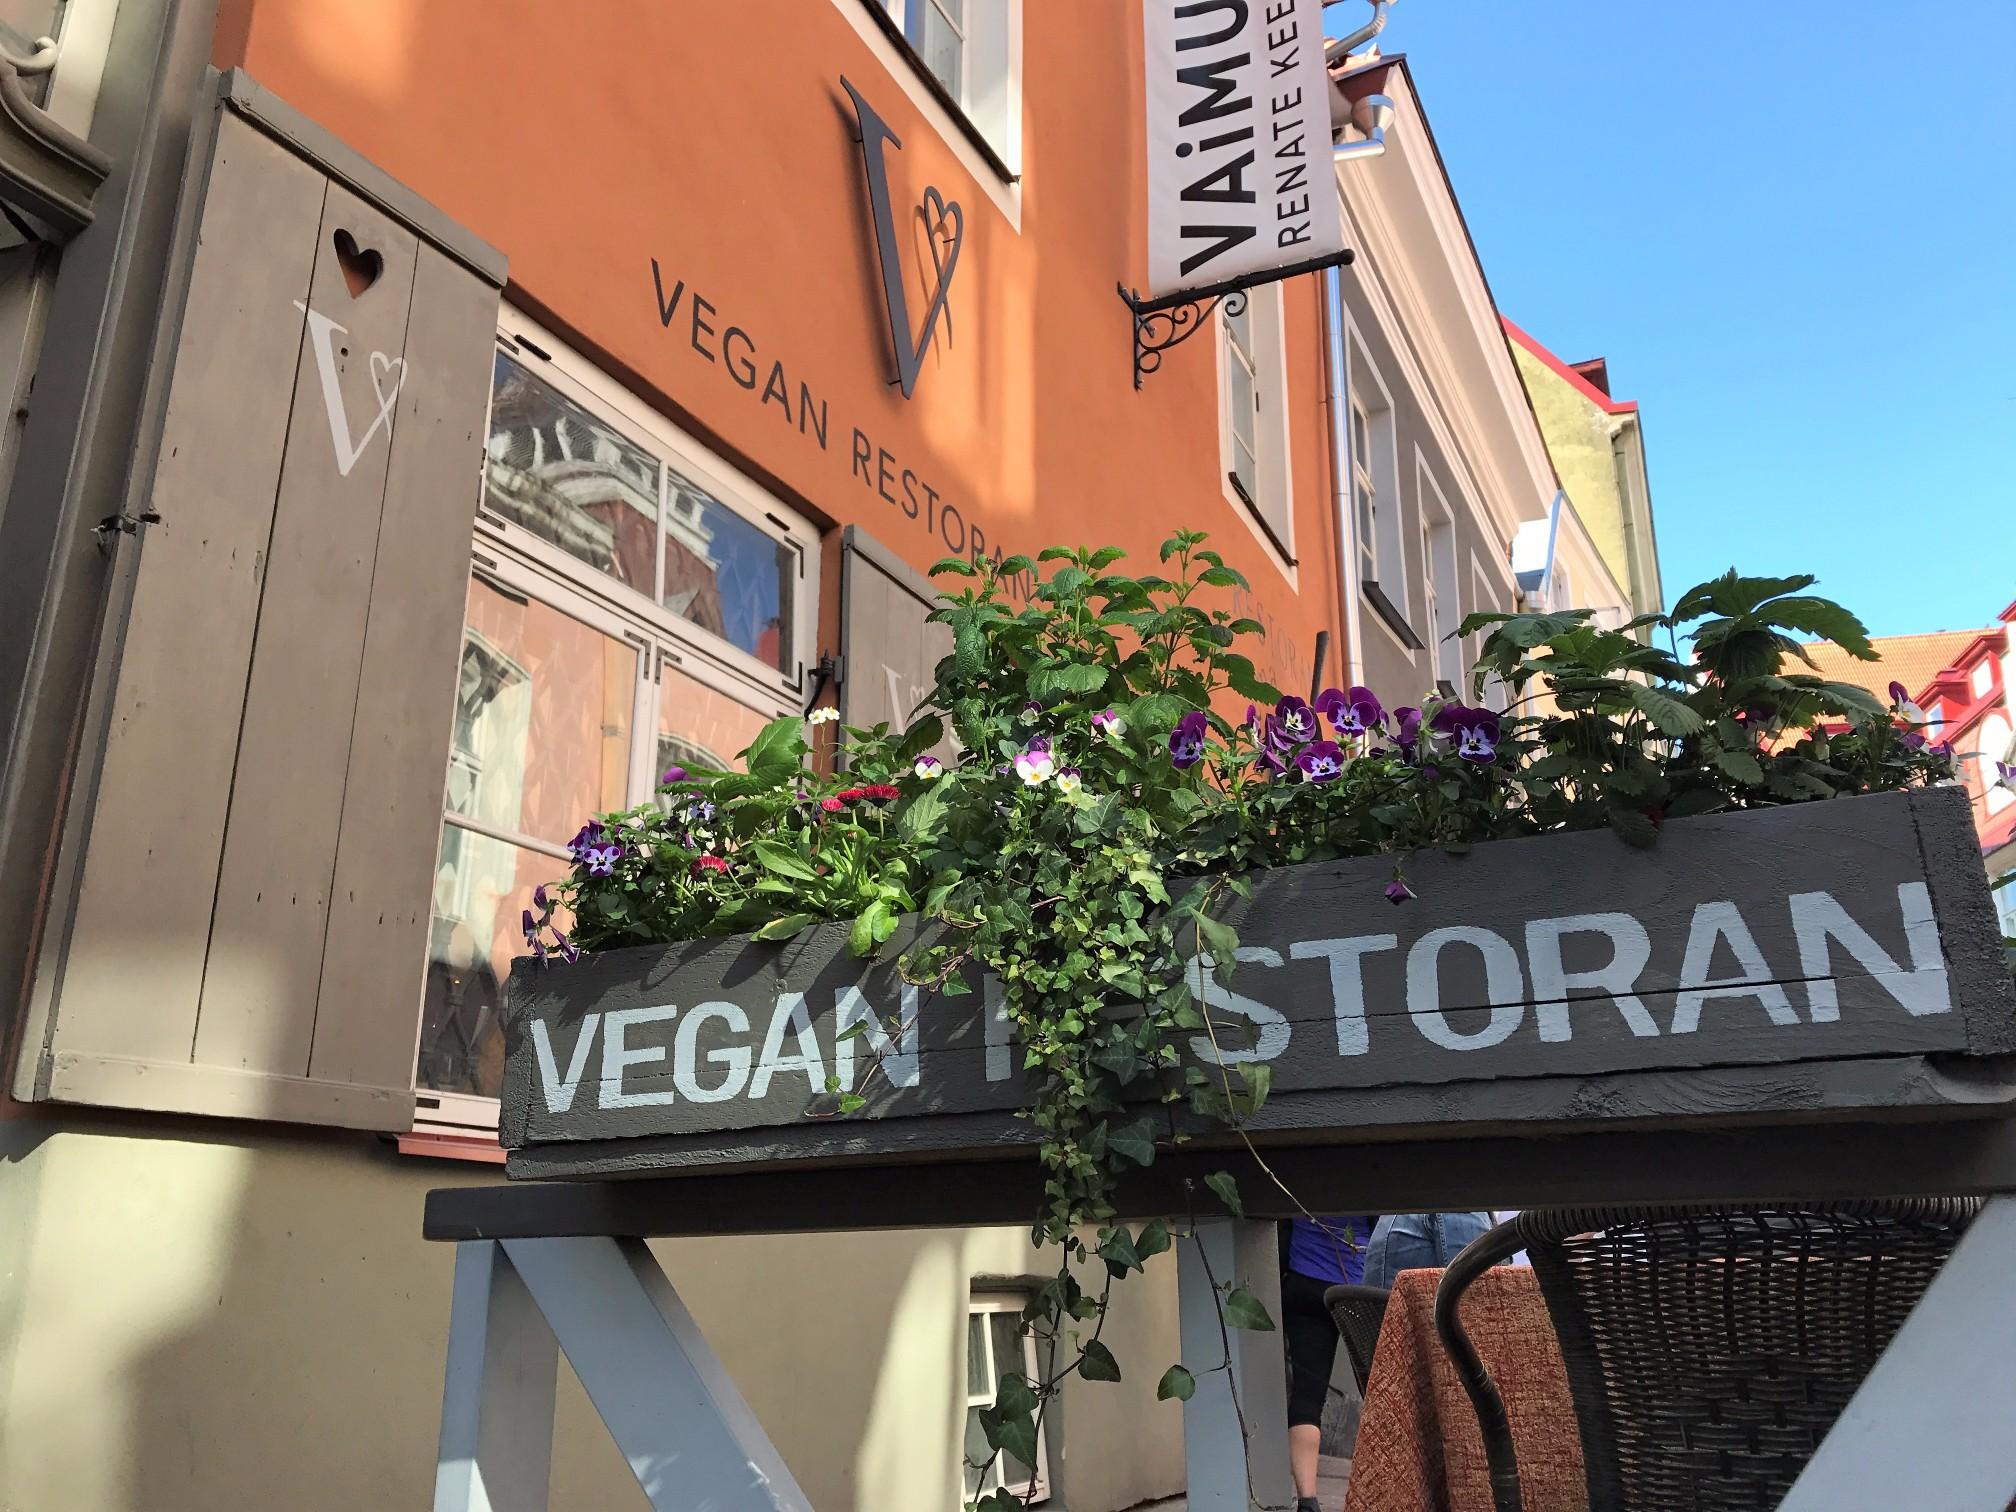 Old Town Vegan Restaurant